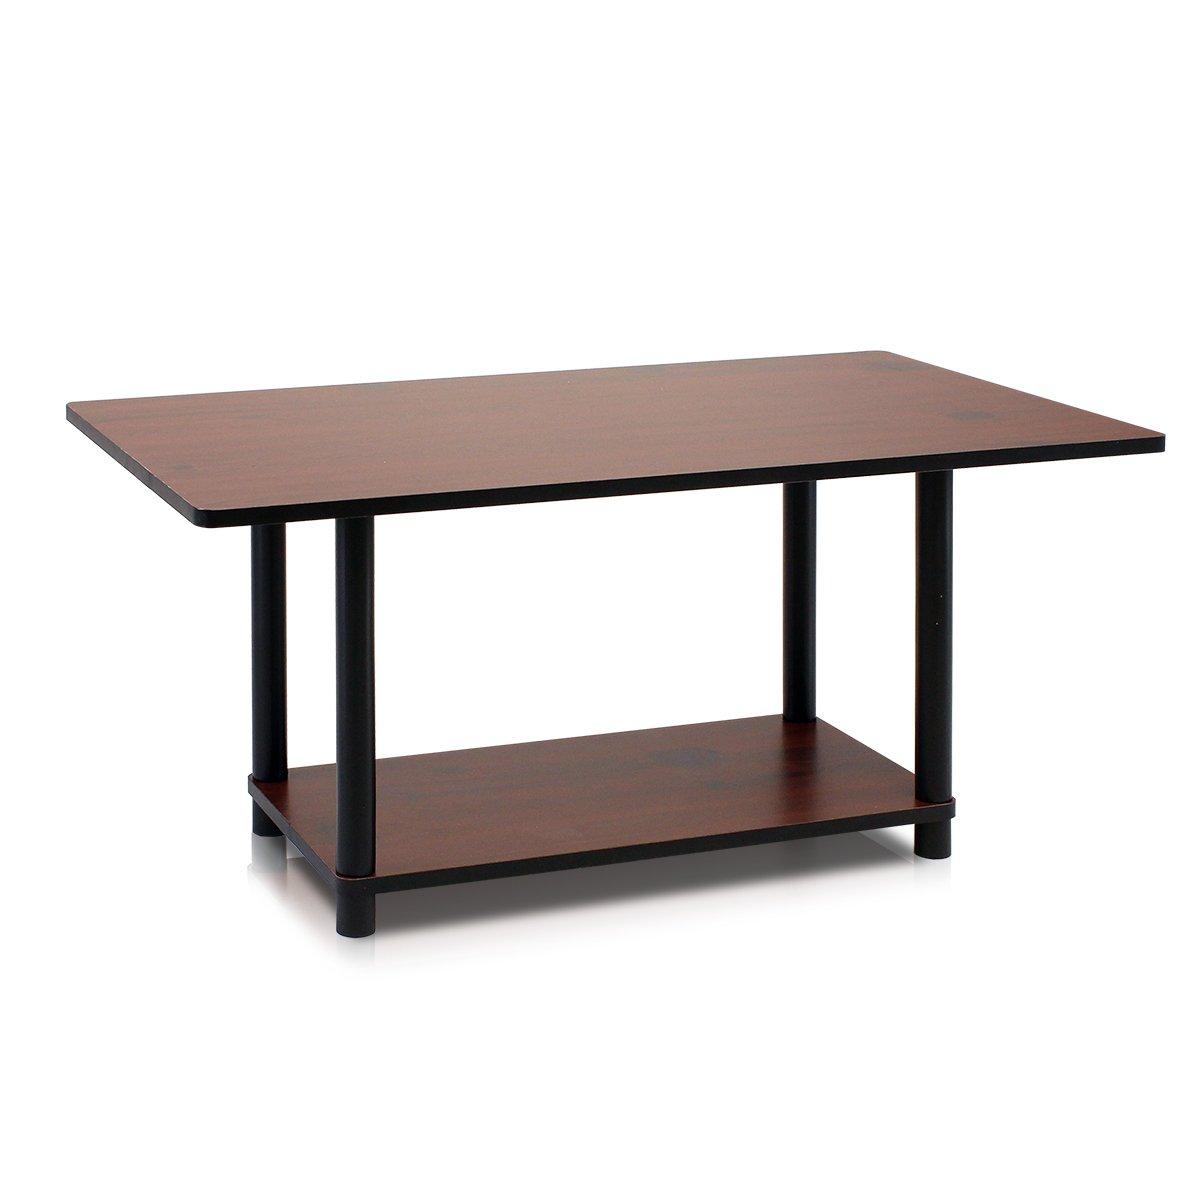 Amazon.com: Furinno 99192DC/BK Turn N Tube Coffee Table, Dark Cherry/Black:  Kitchen U0026 Dining